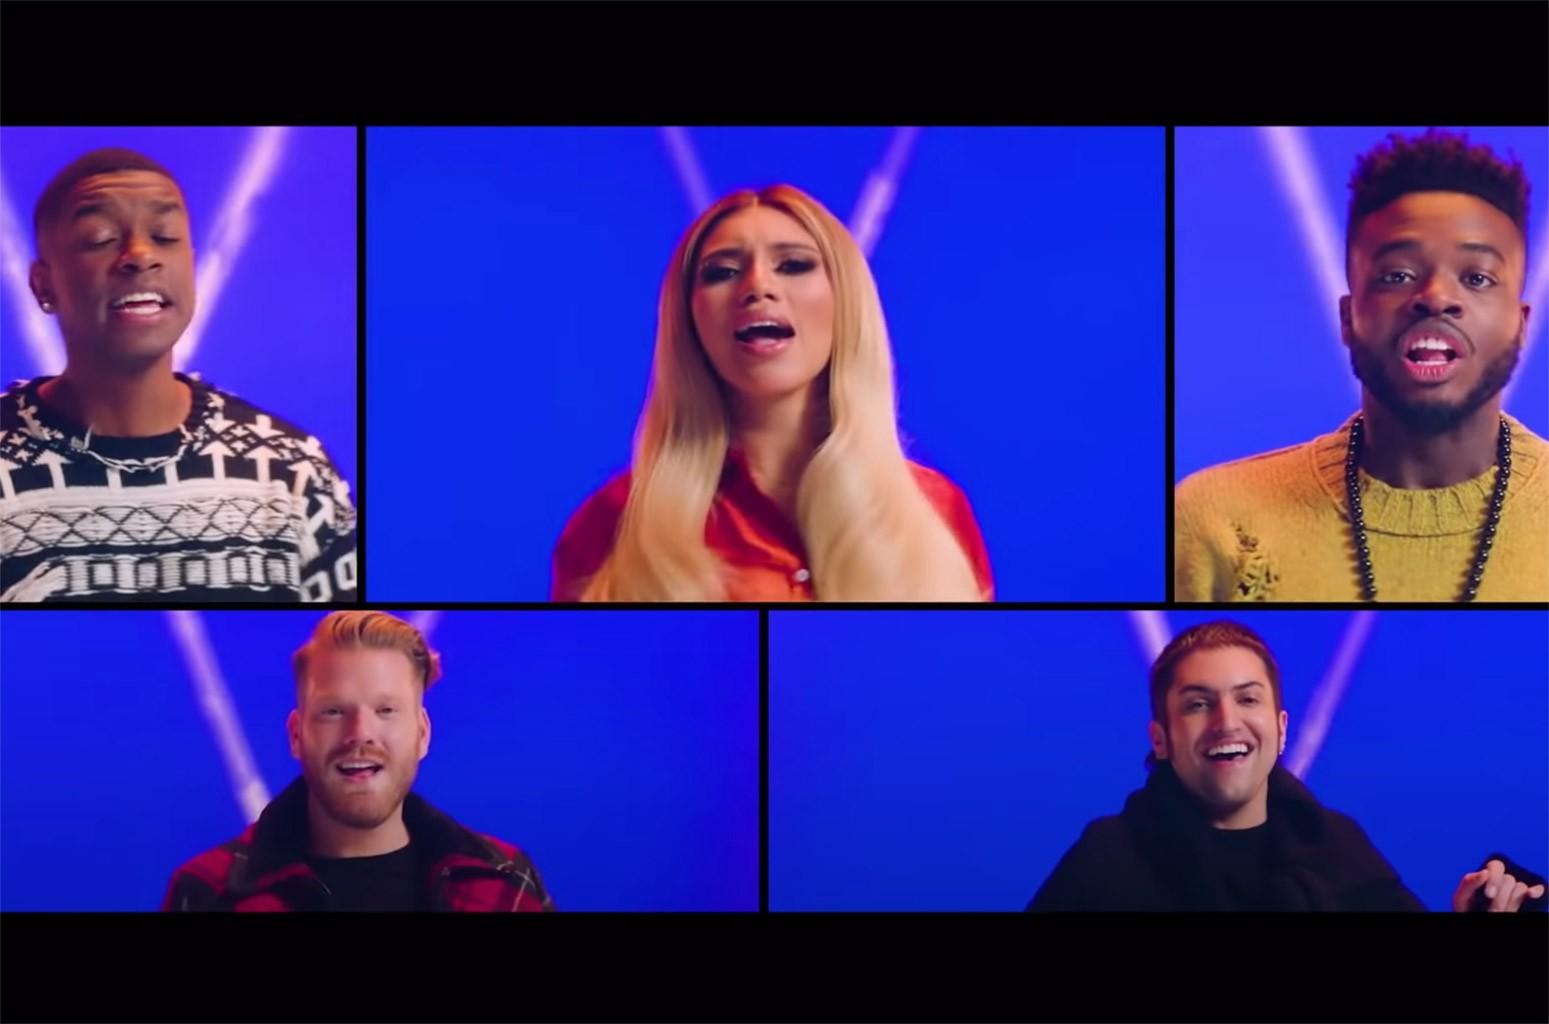 Watch Pentatonix Take a Tour Through Musical Genres in '12 Days of Christmas' Video | Billboard